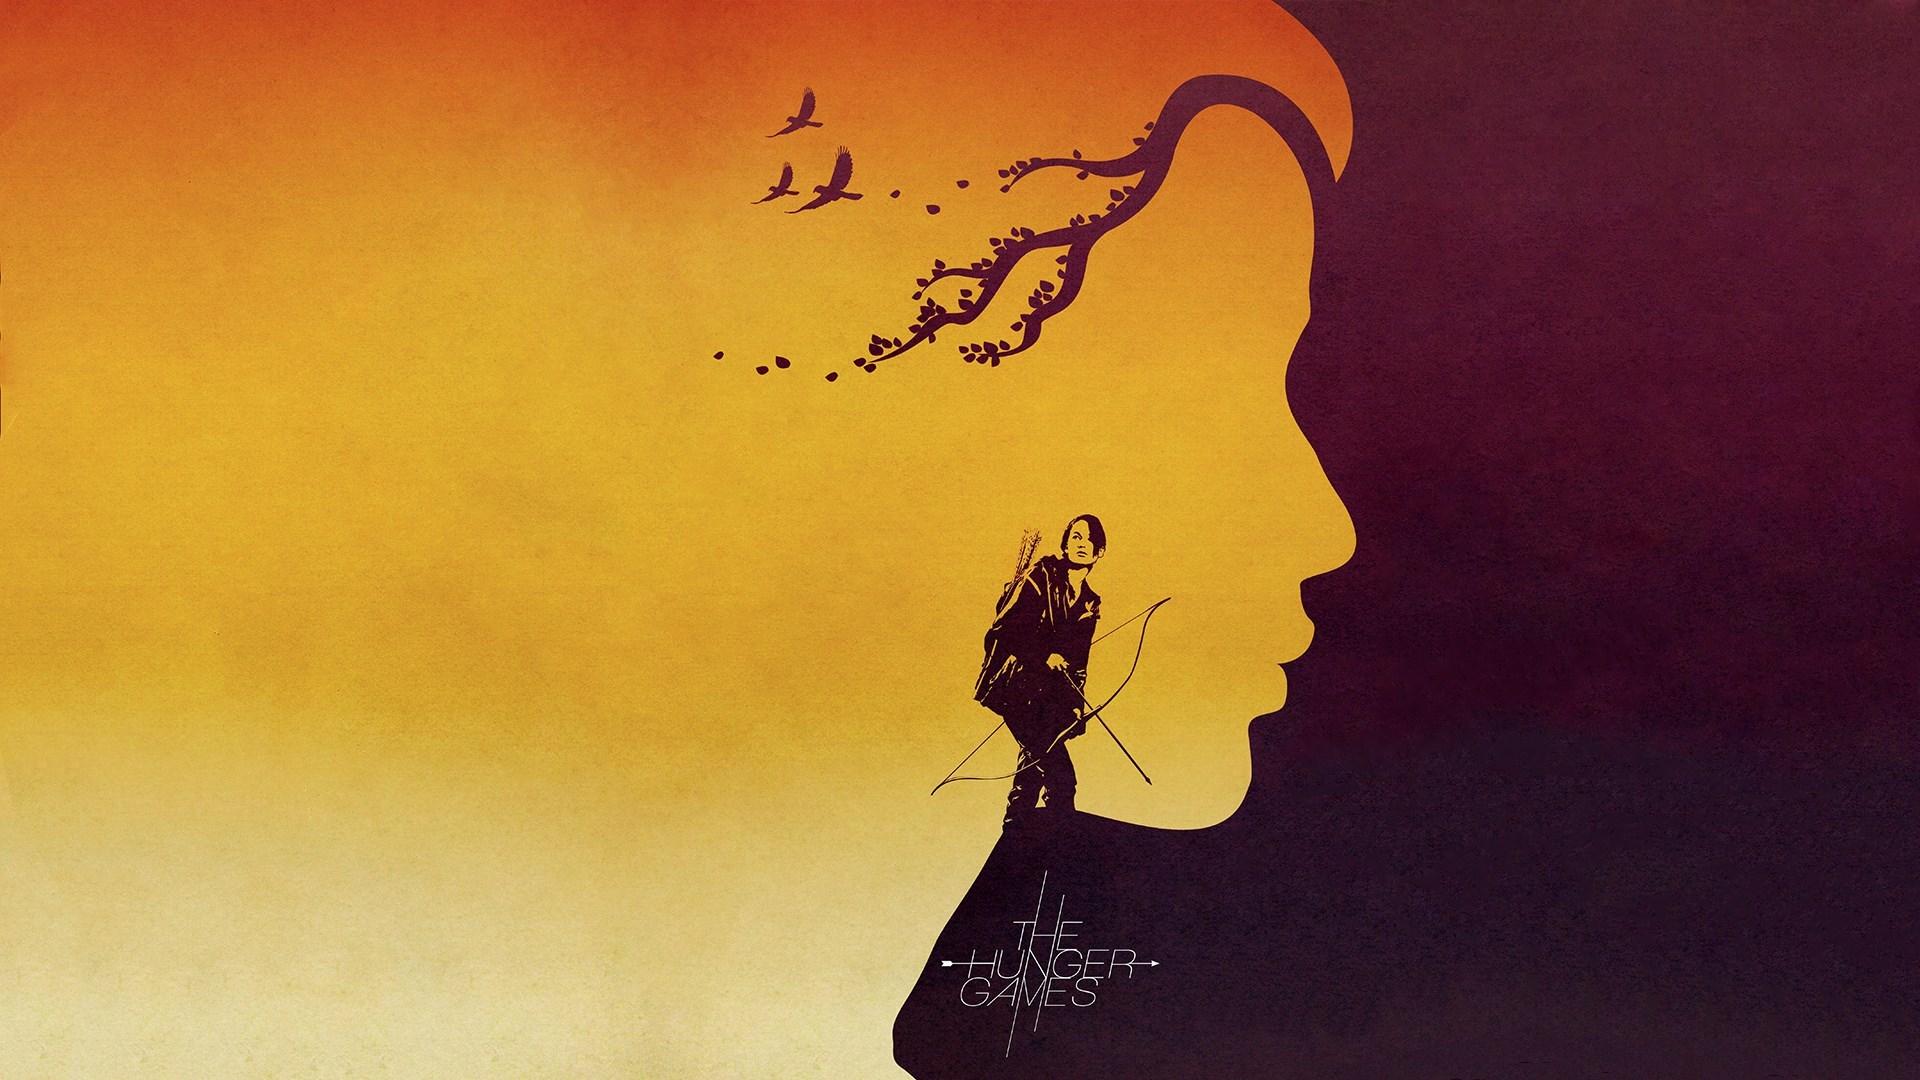 The Hunger Games Art